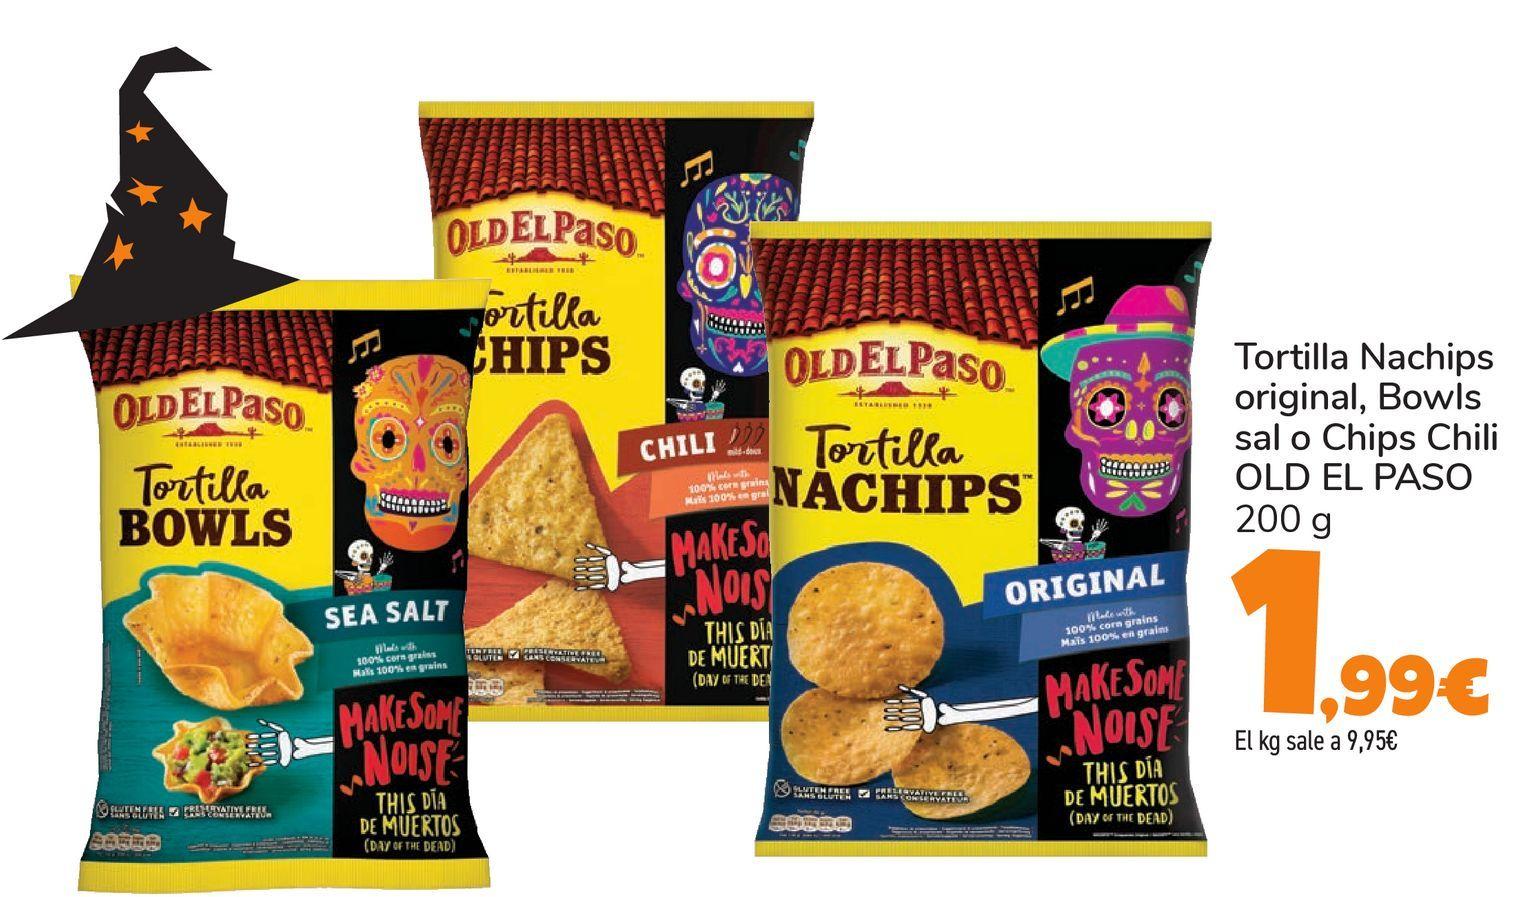 Oferta de Tortilla Nachips original, Bowls sal o Chips Chili OLD EL PASO por 1,99€